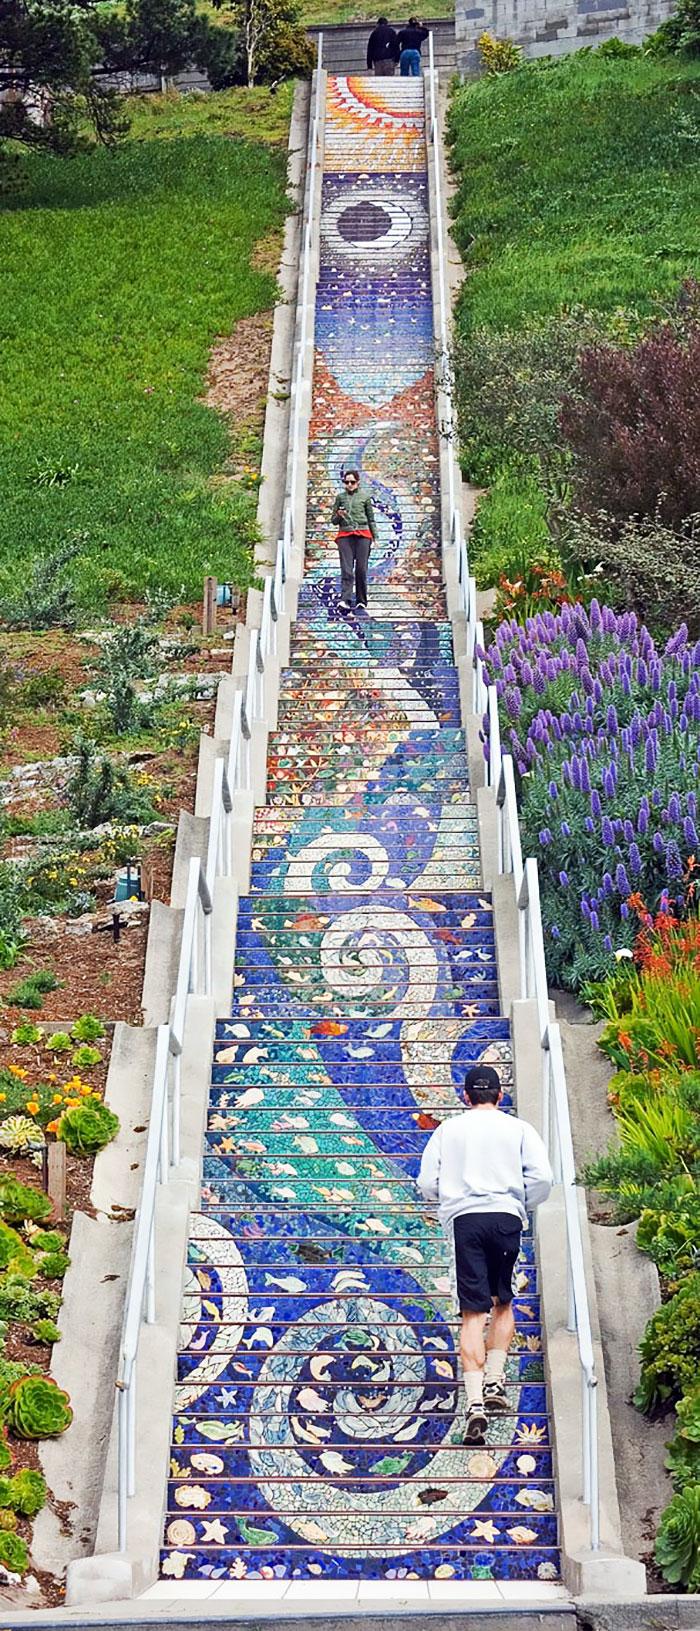 scalinata-san-francisco-mosaico-piastrelle-colorate-splende-notte-2